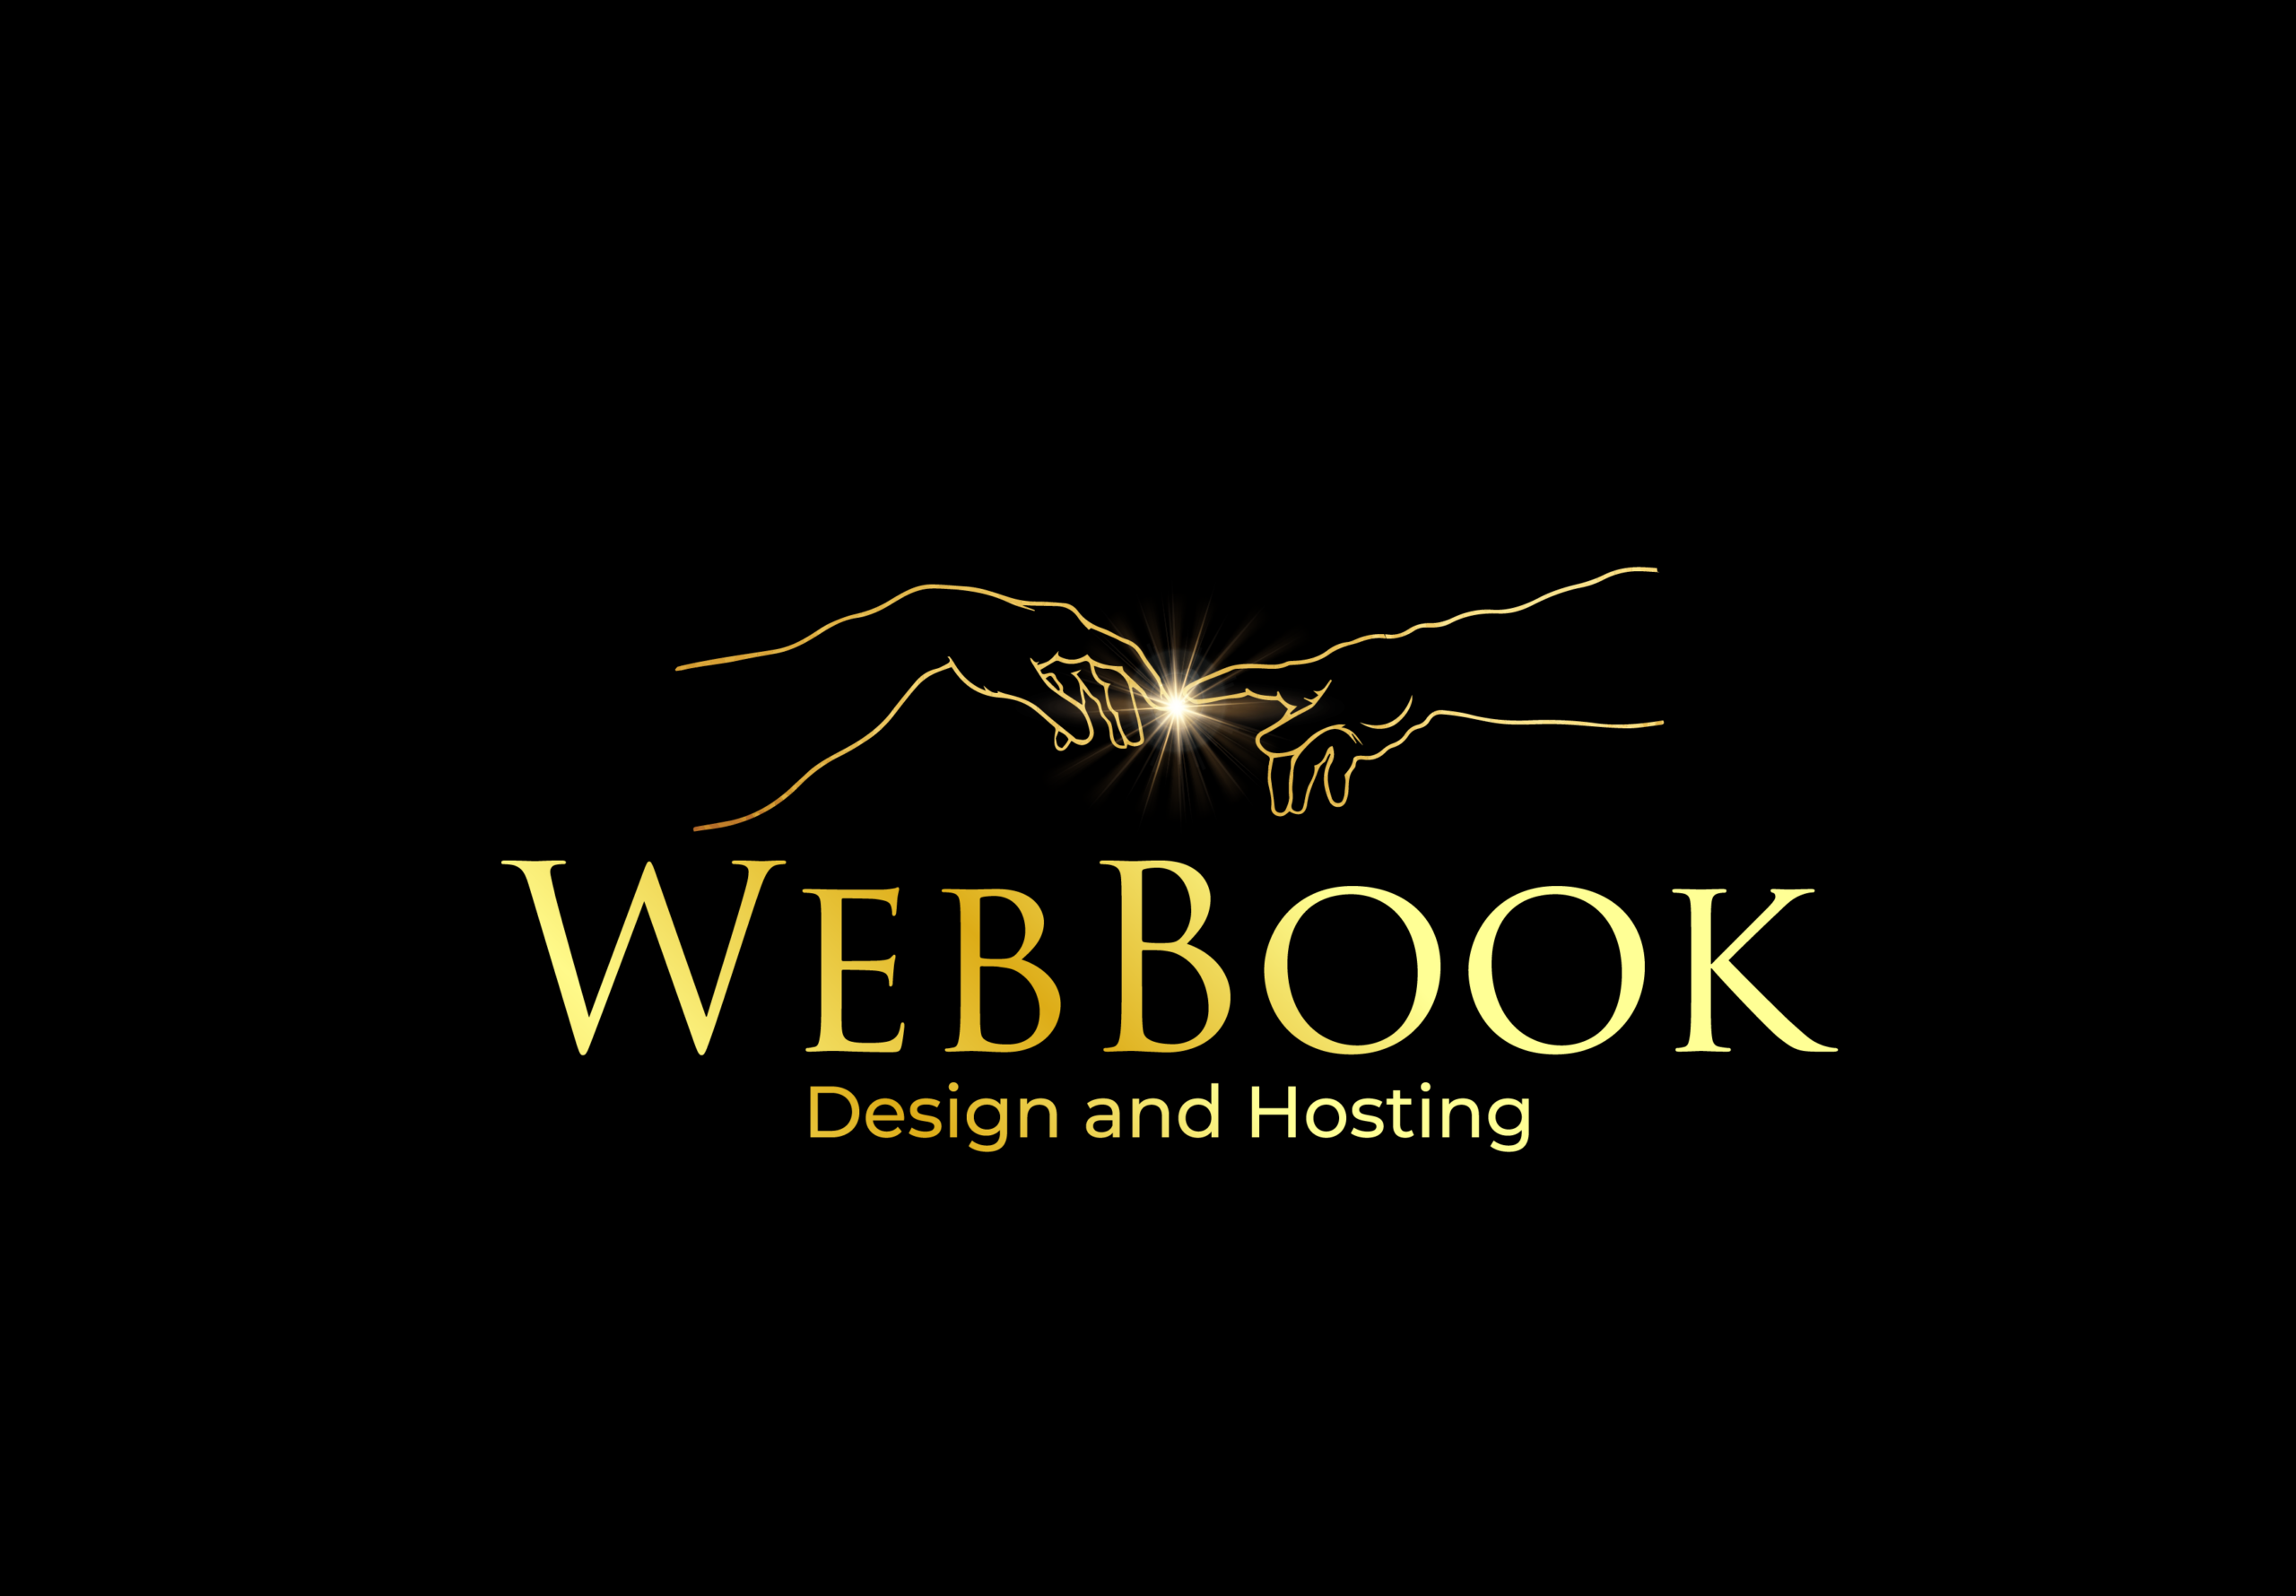 webbookdesign logo